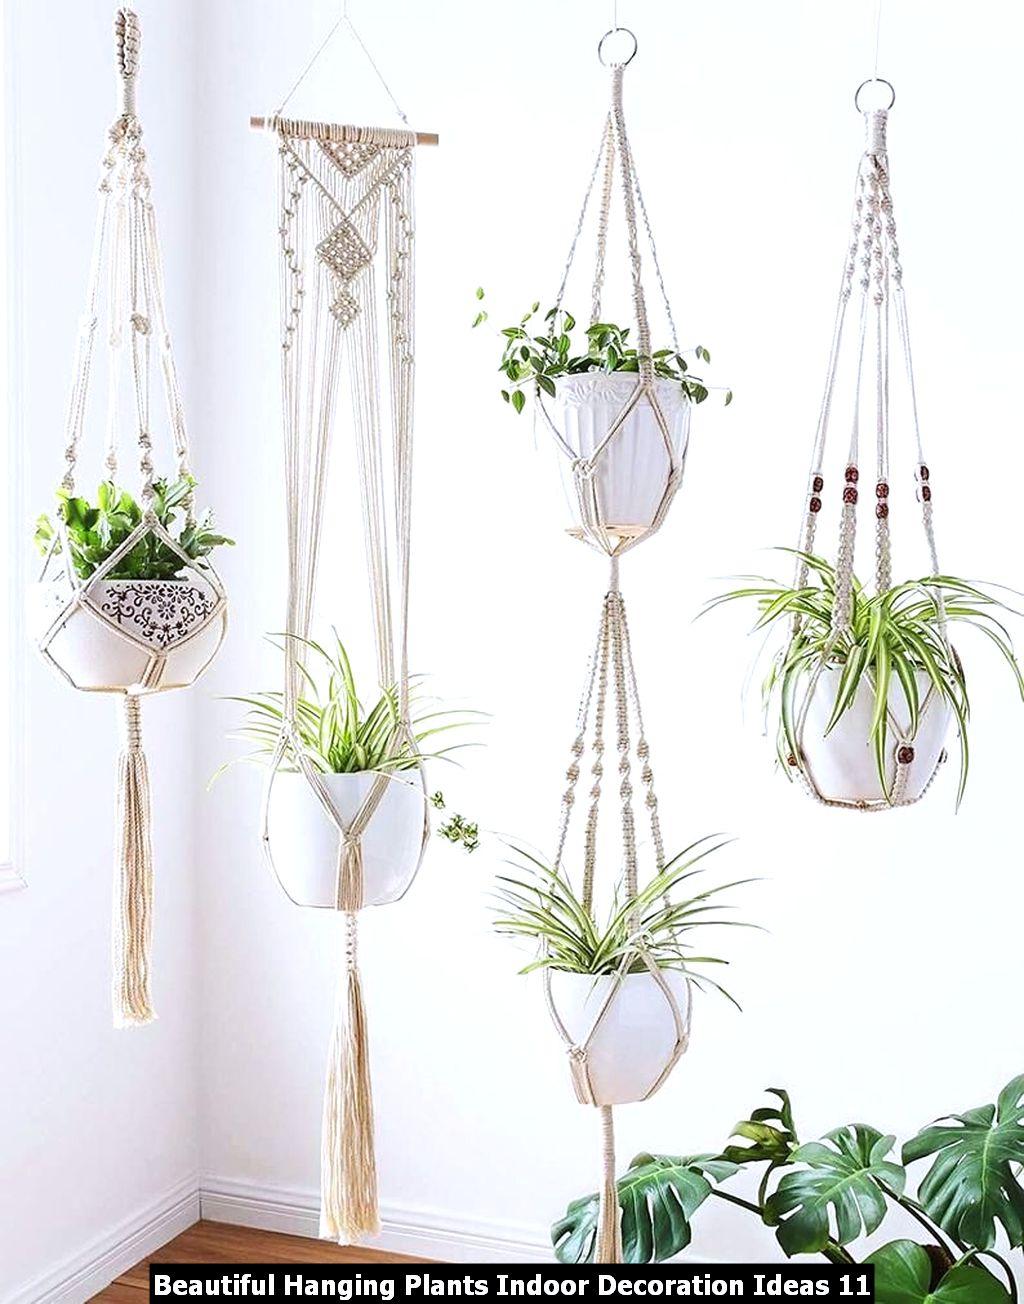 Beautiful Hanging Plants Indoor Decoration Ideas 11